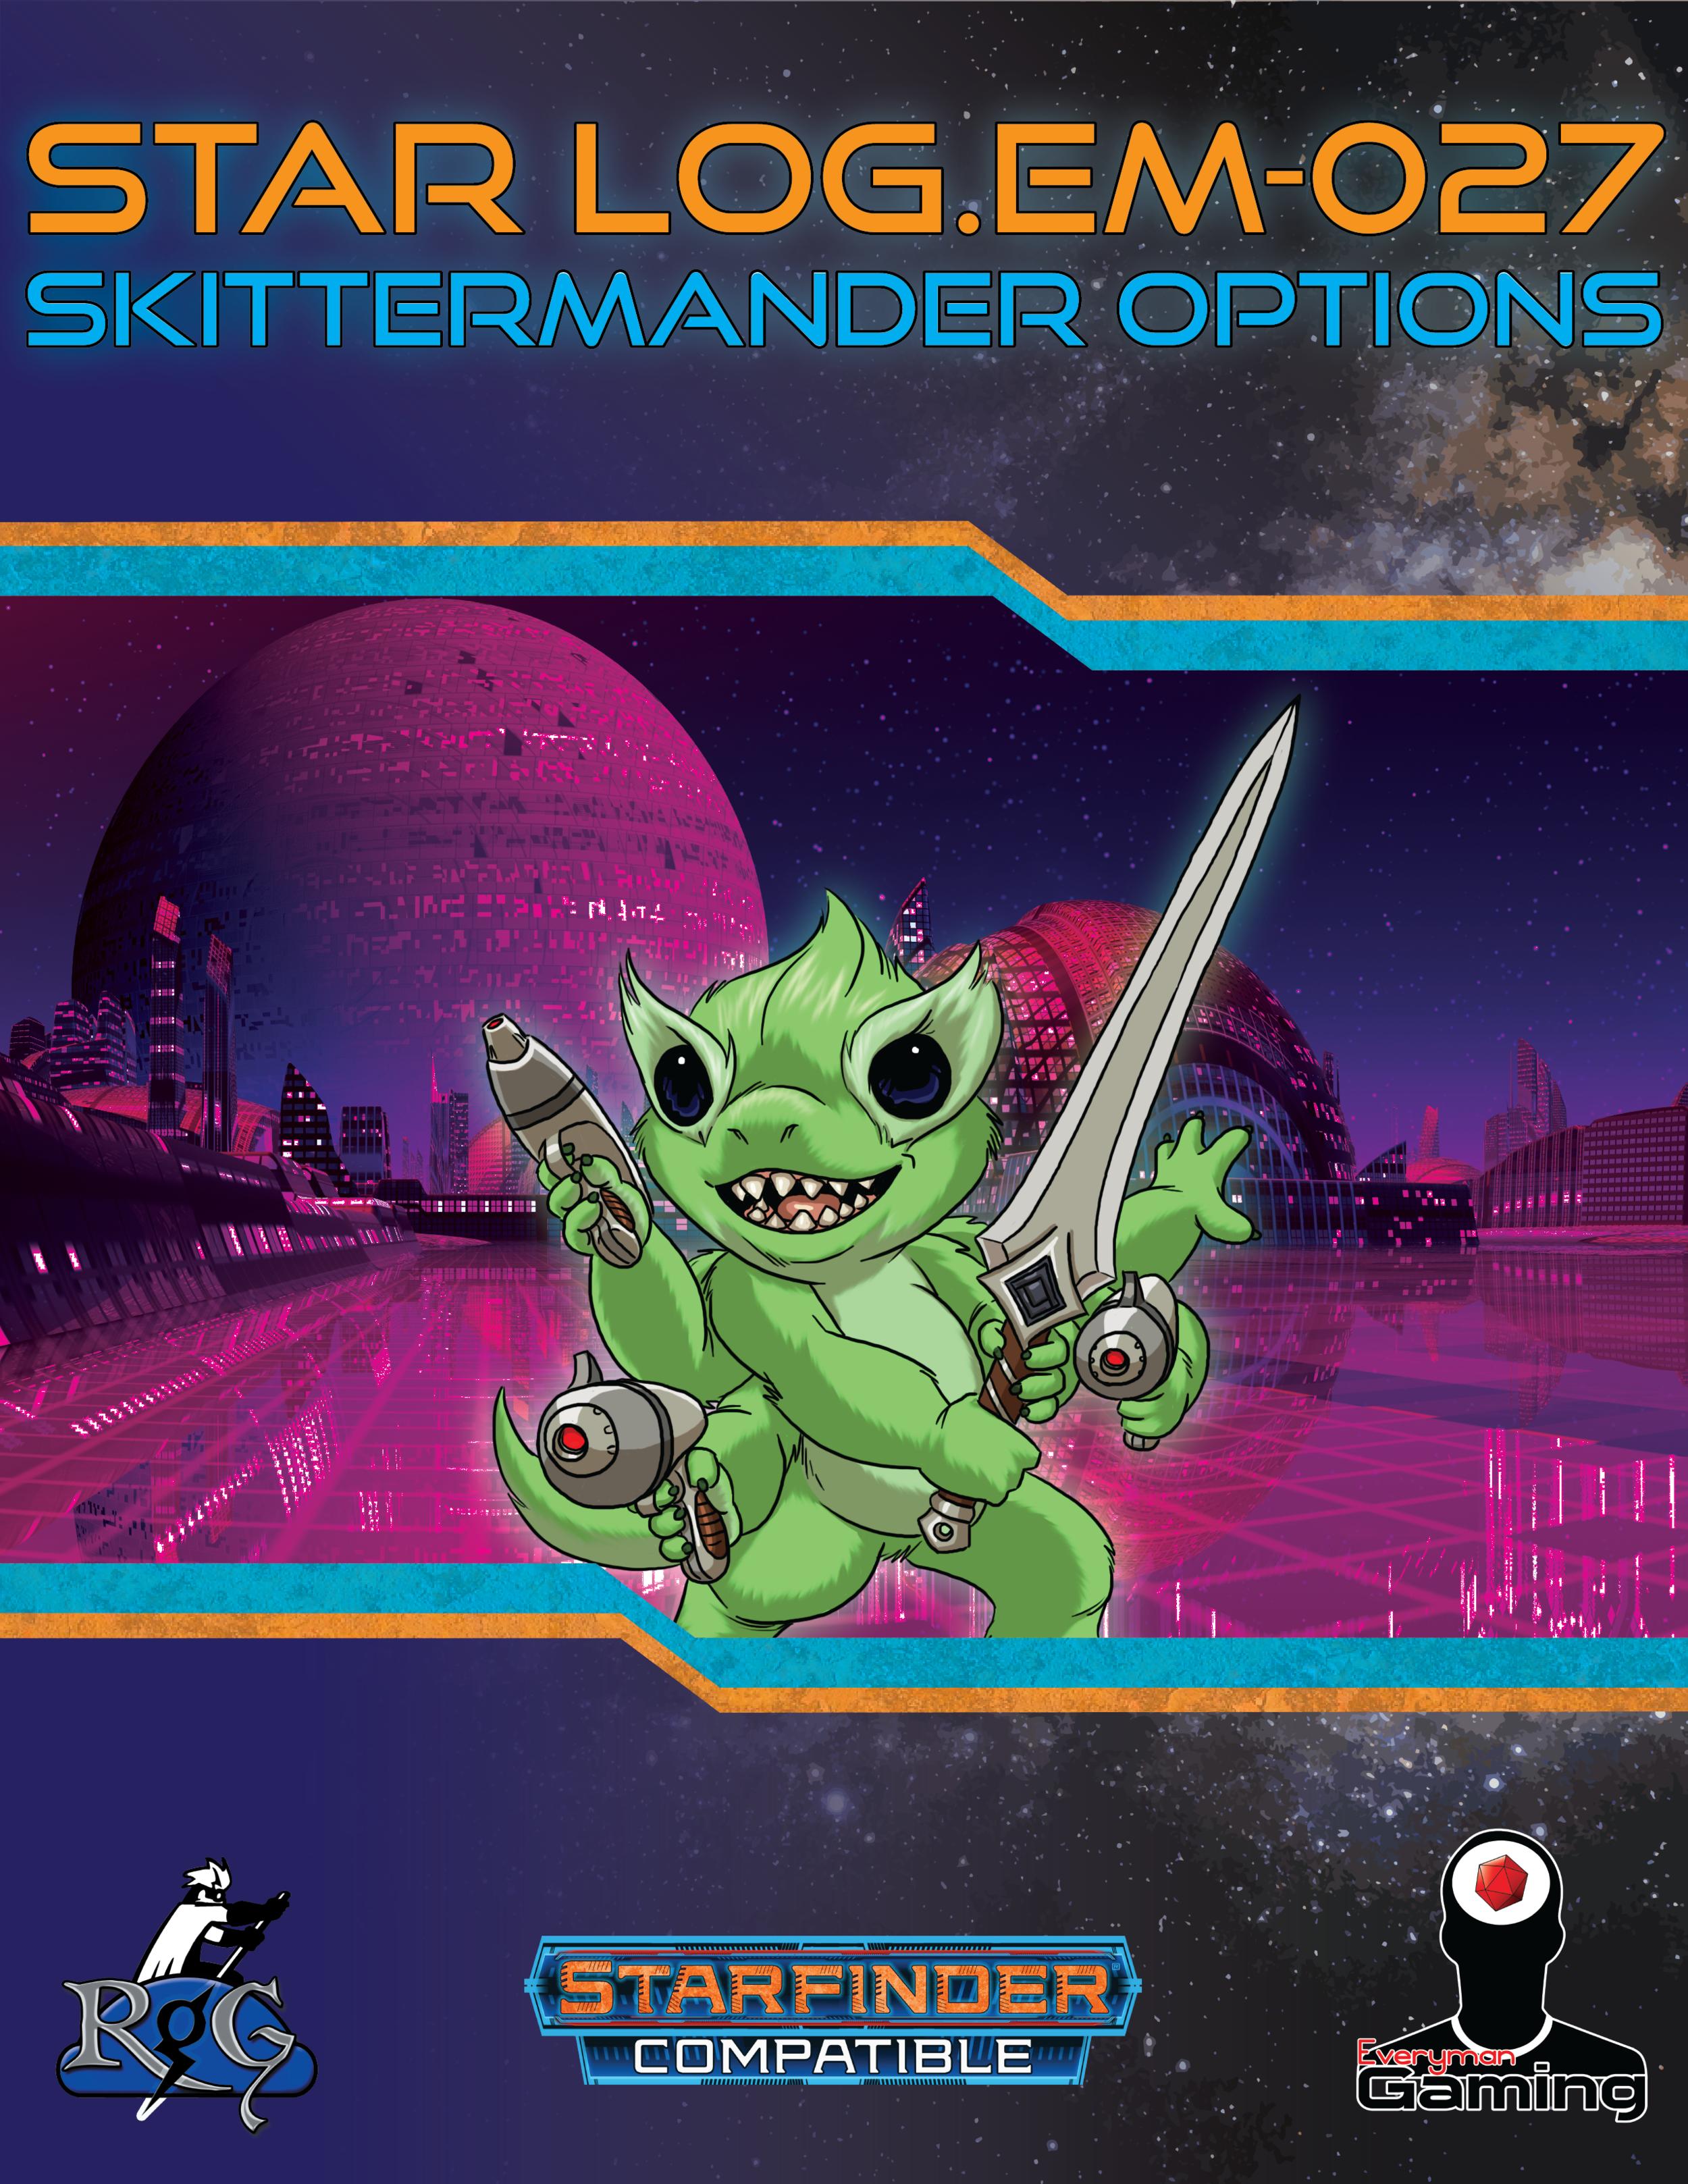 SF027 Skittermander Options.png